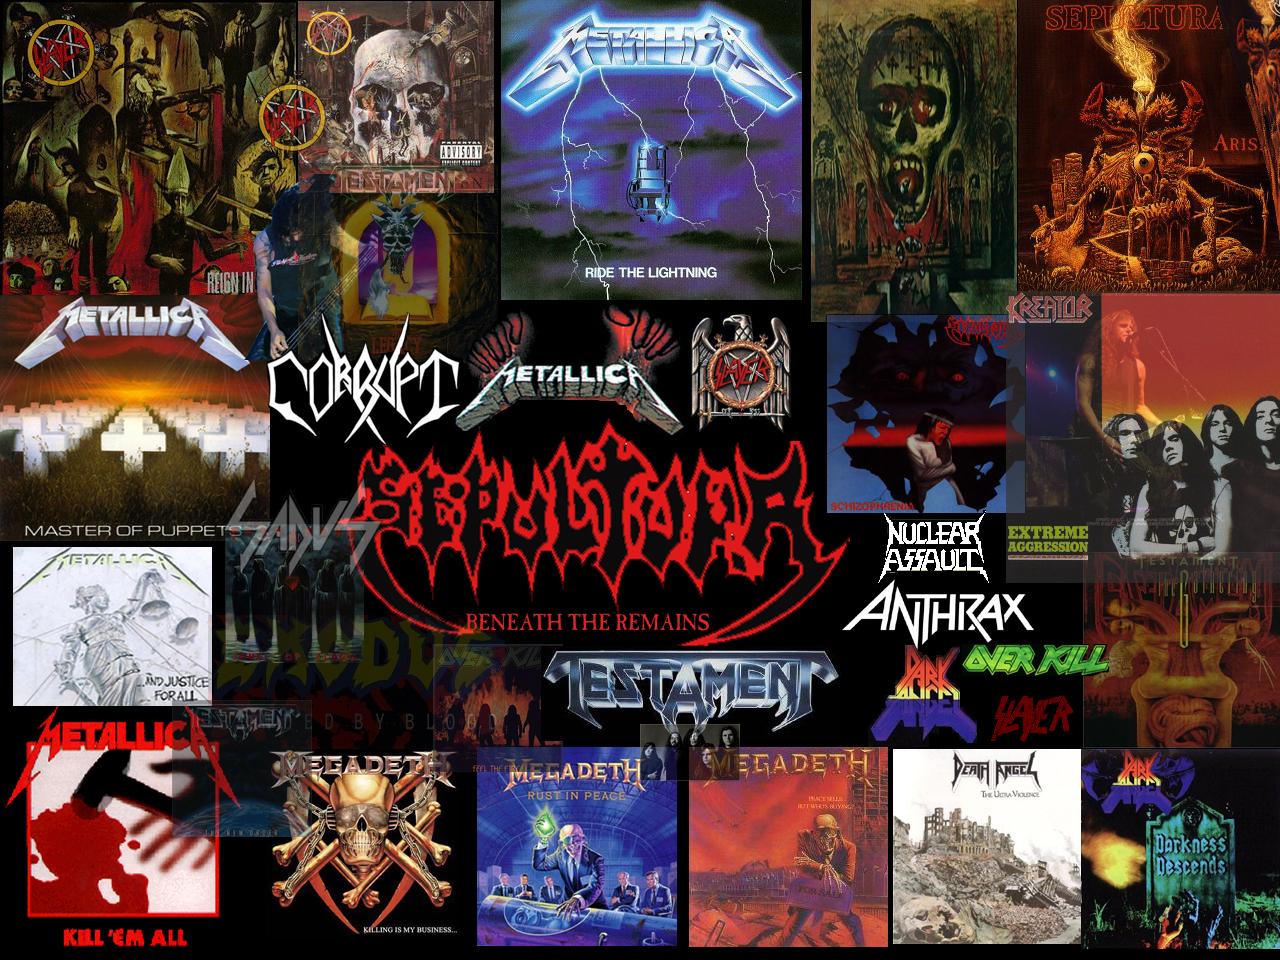 Music Heavy Metal Wallpaper 1280x960 Music Heavy Metal 1280x960